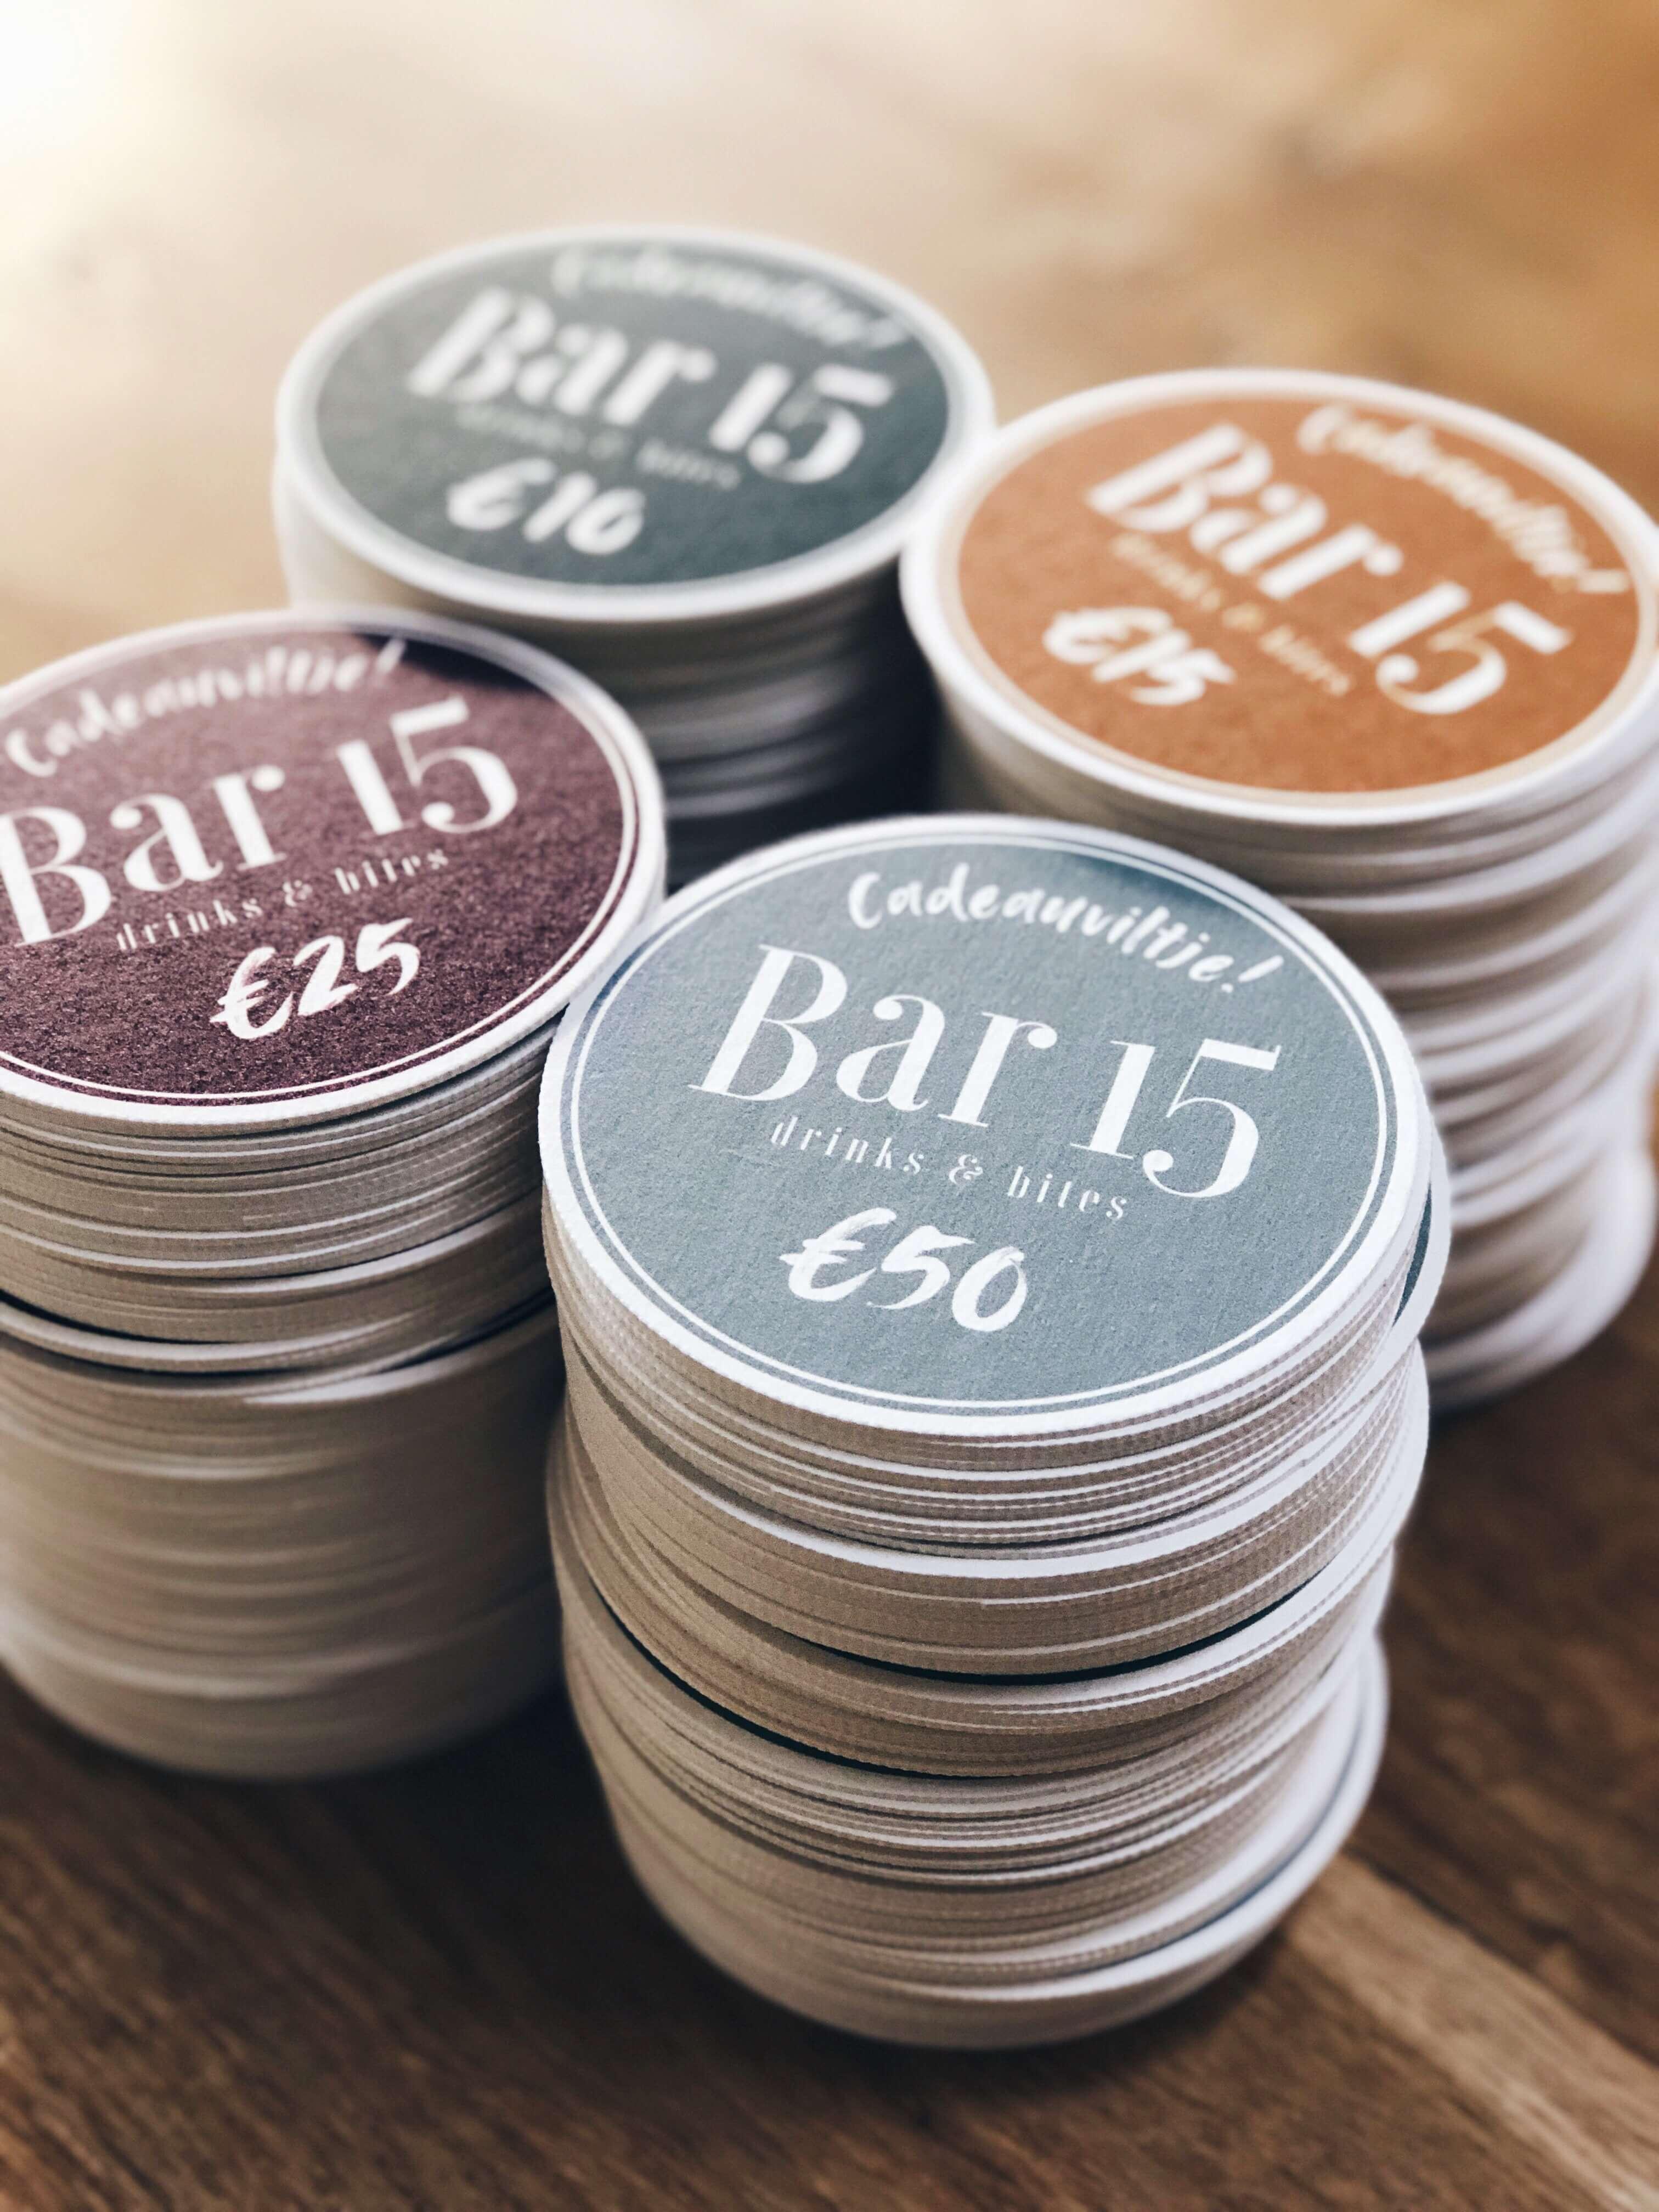 Bar15 Cadeauviltjes